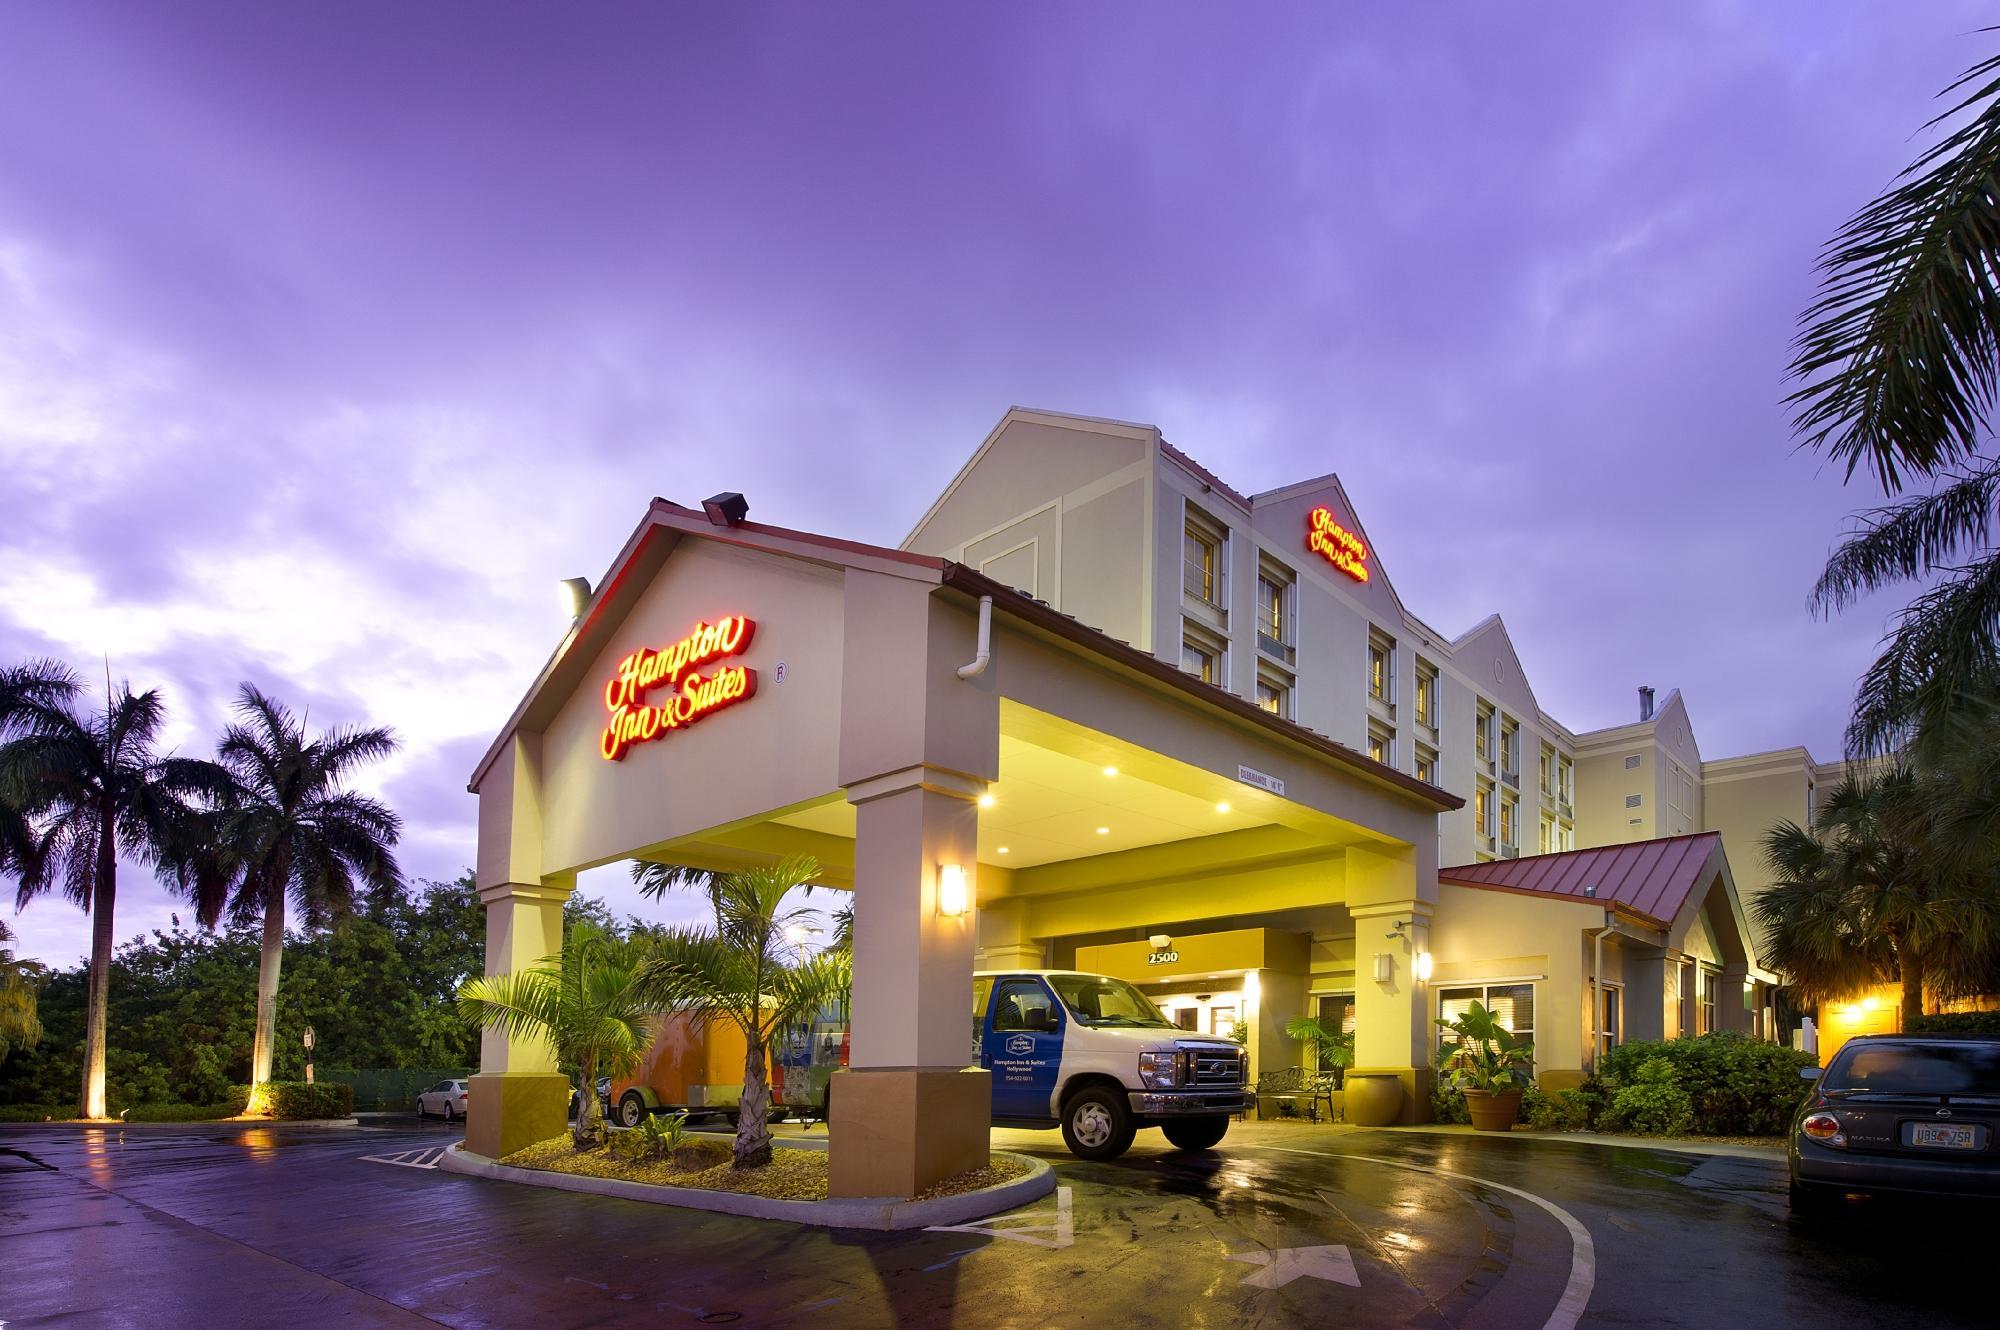 Hampton Inn & Suites Ft. Lauderdale-Airport/South Cruise Port